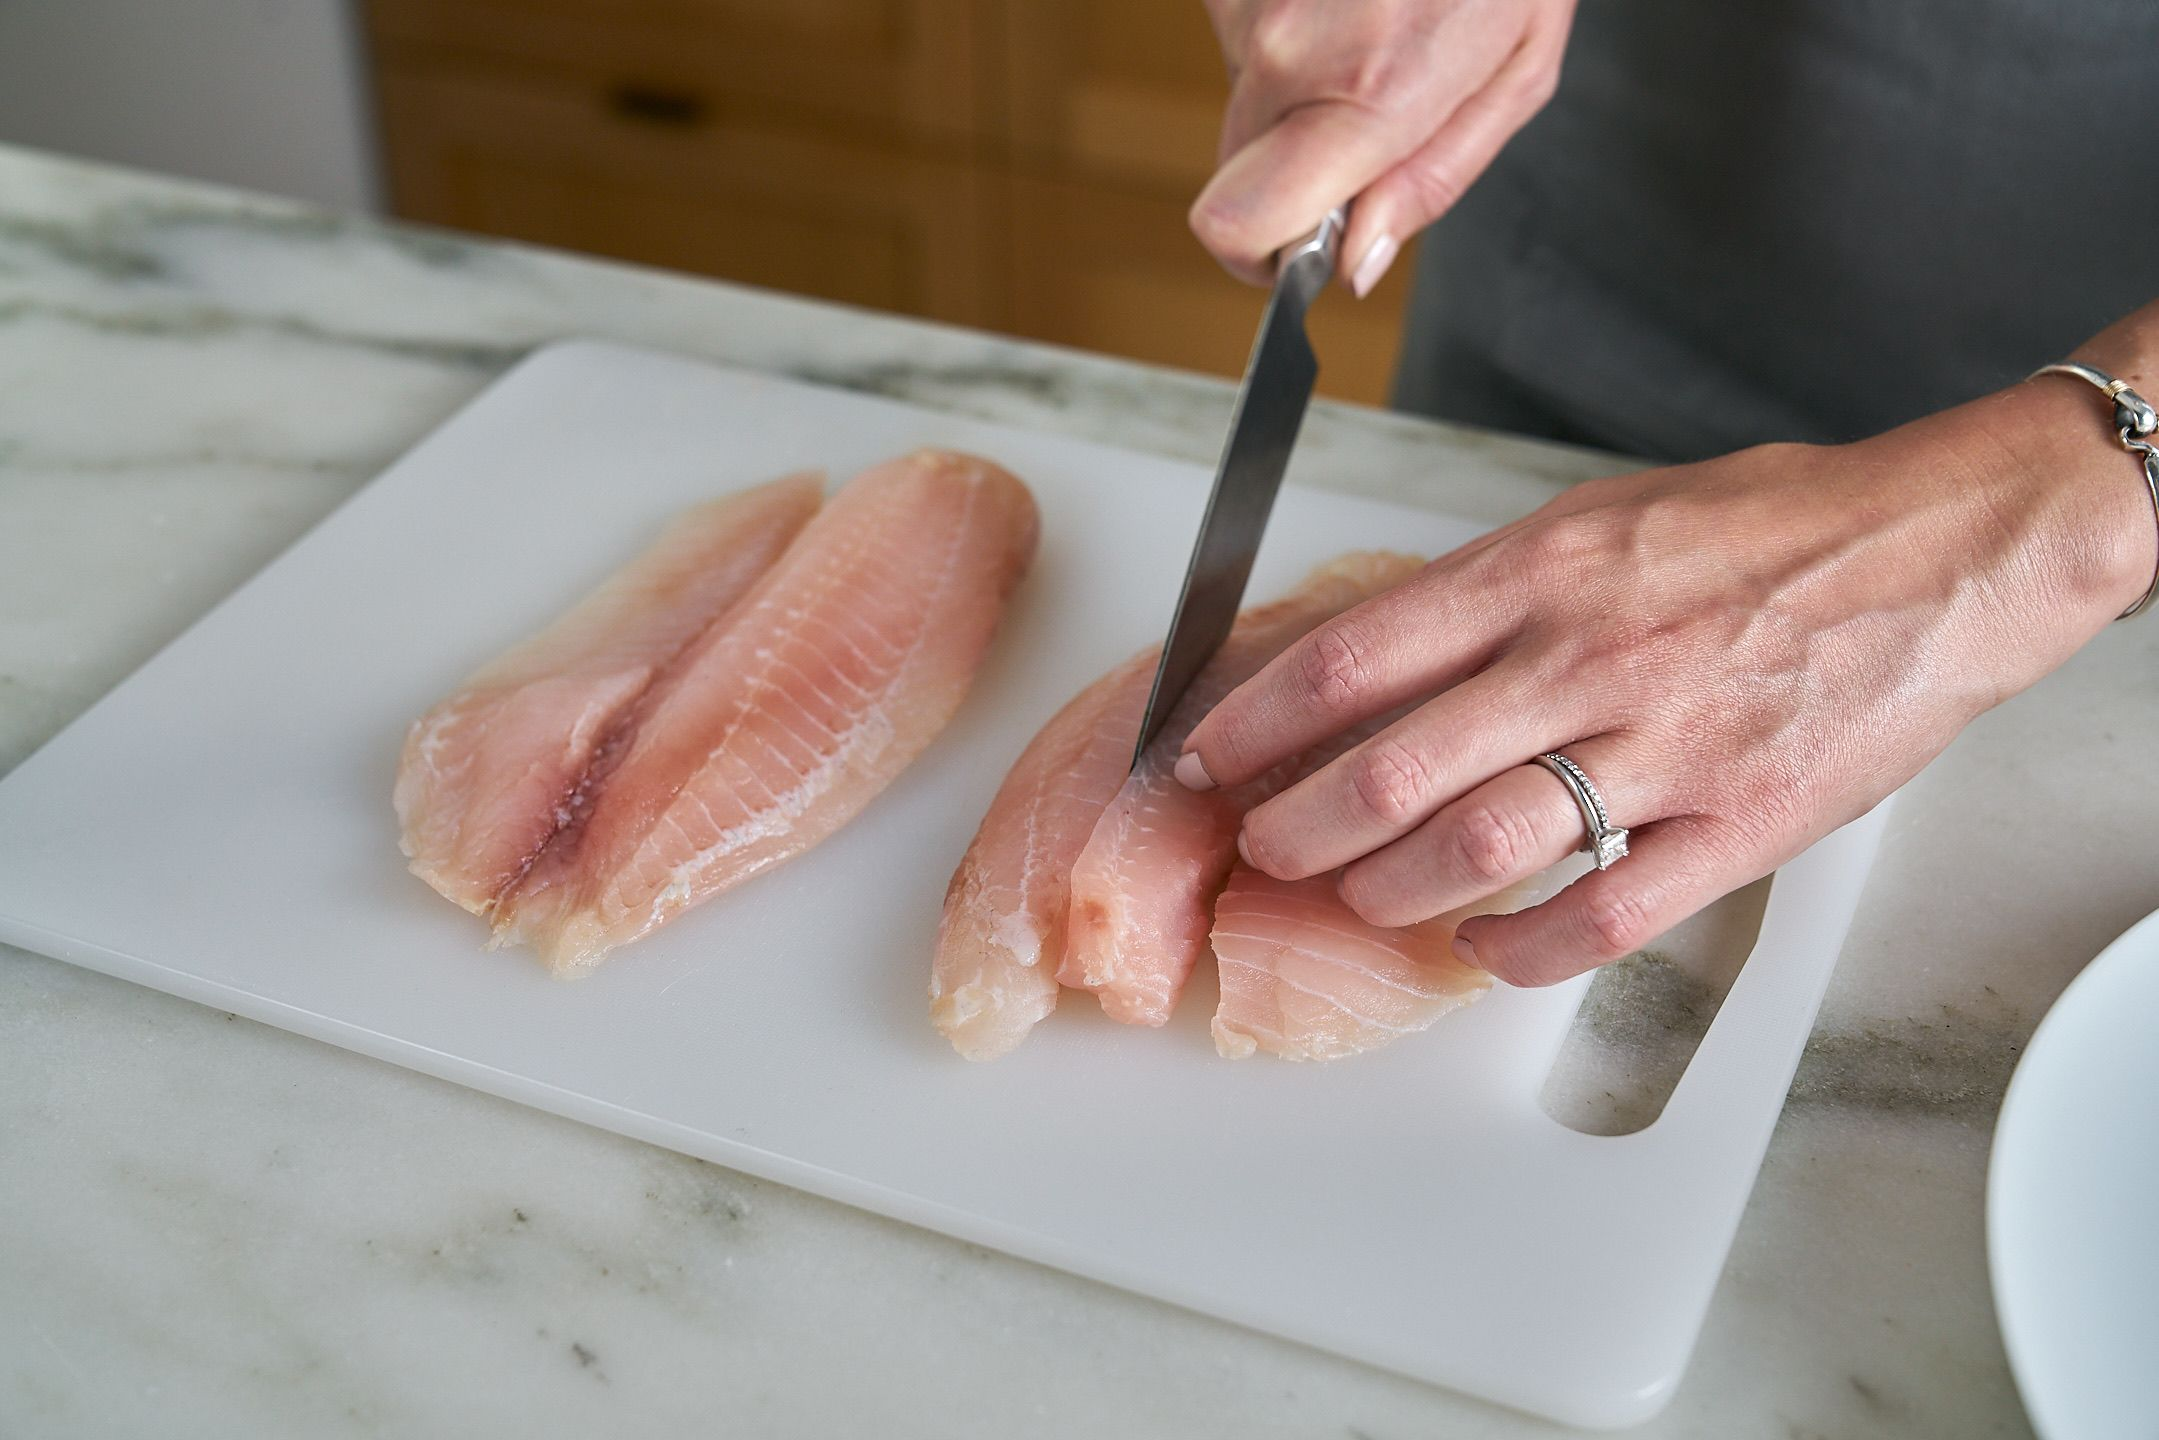 Cut fish into pieces.